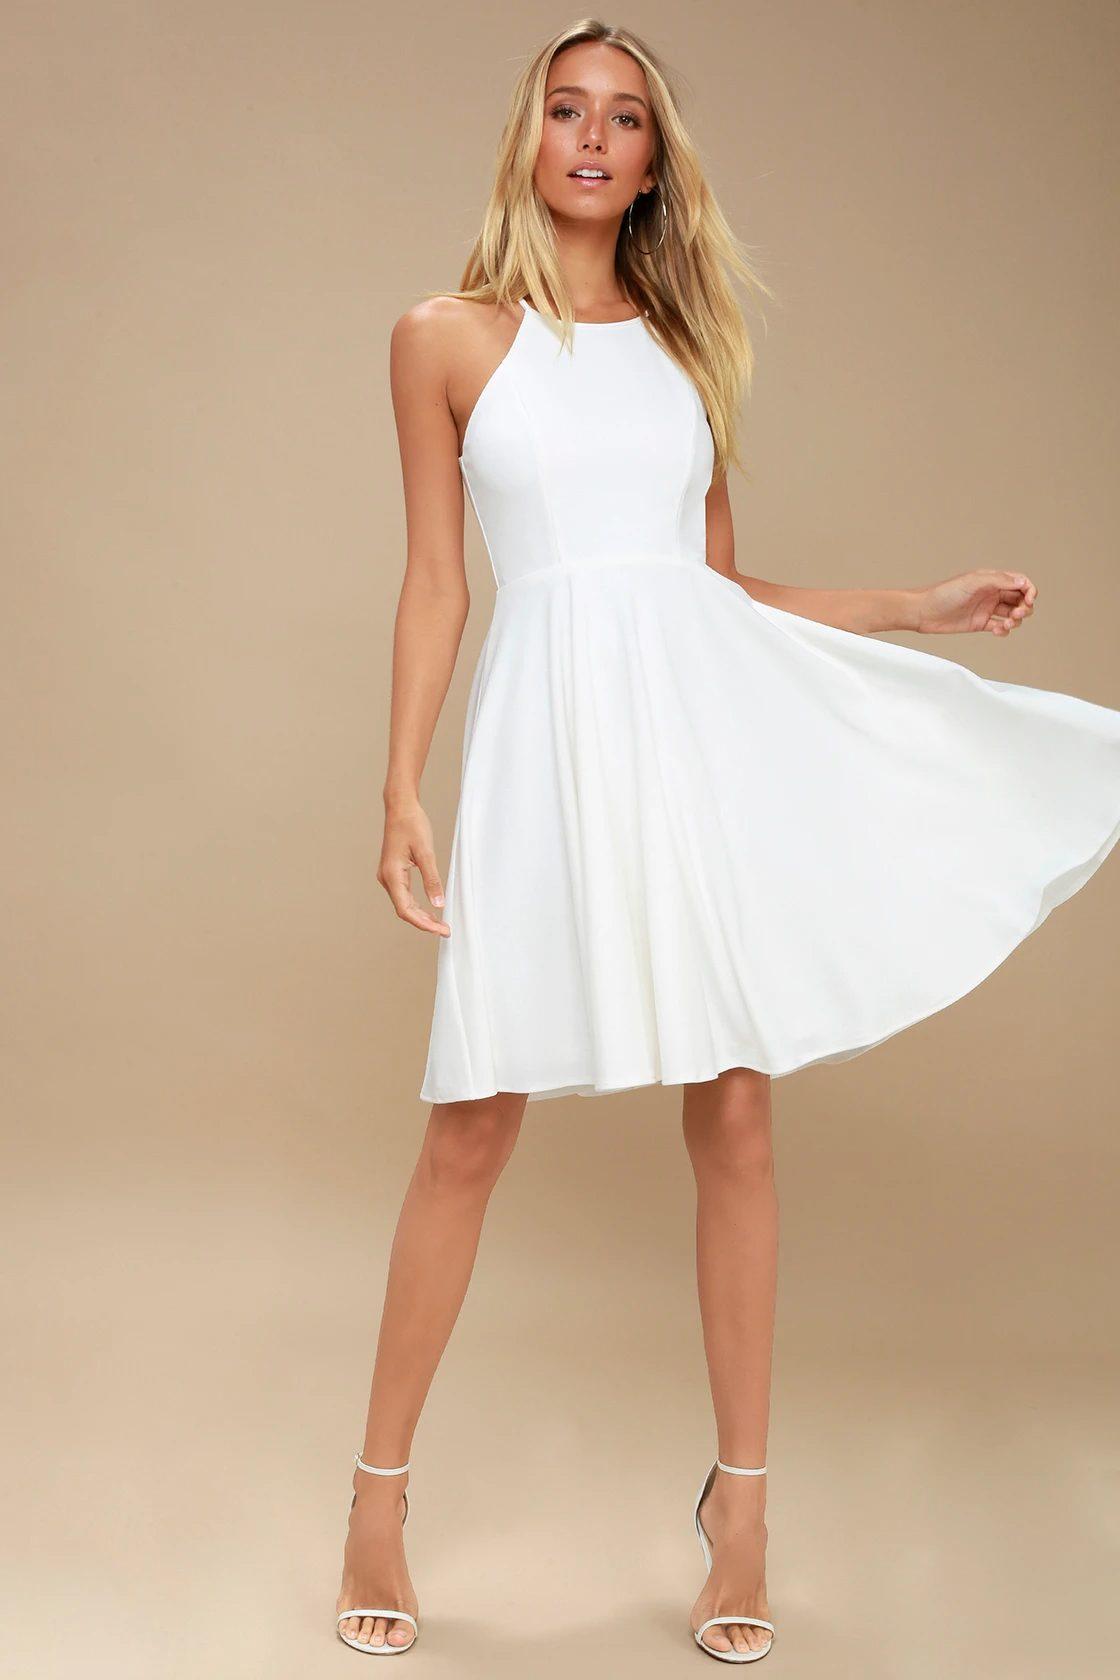 White A-line graduation dress